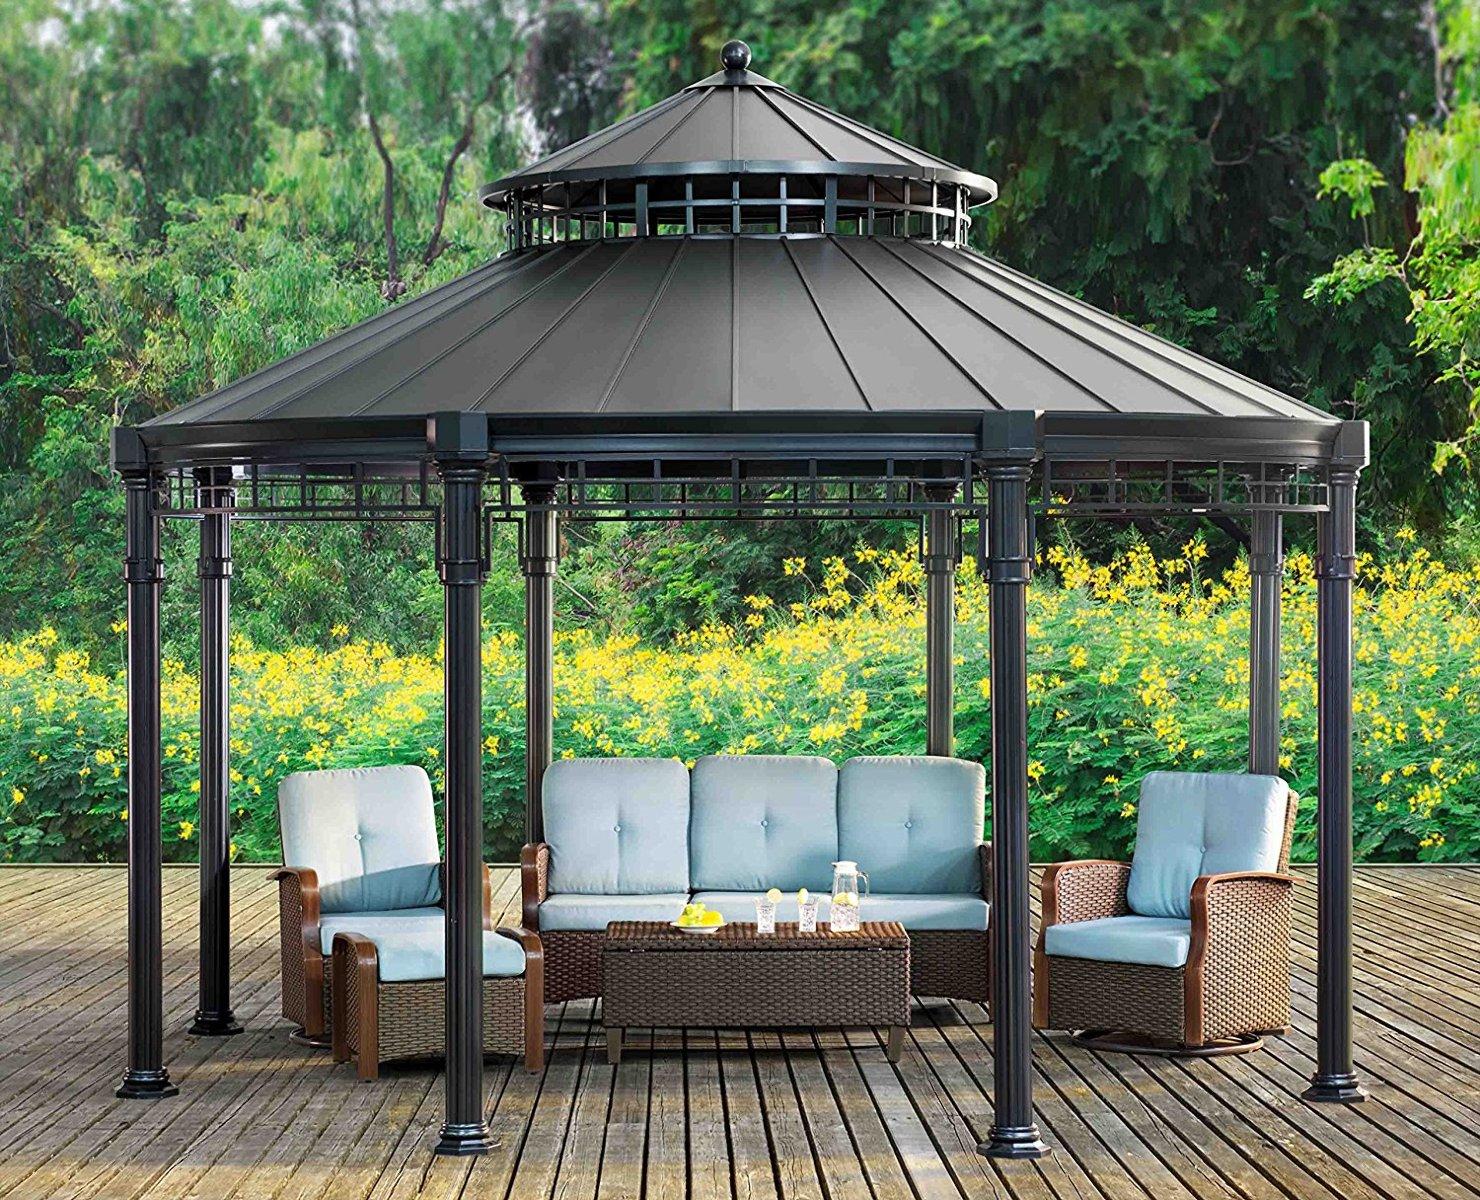 Sunjoy Buffalo 14' x 14' Round Top Heavy Duty Outdoor ... on Outdoor Patio Pavilion id=23300